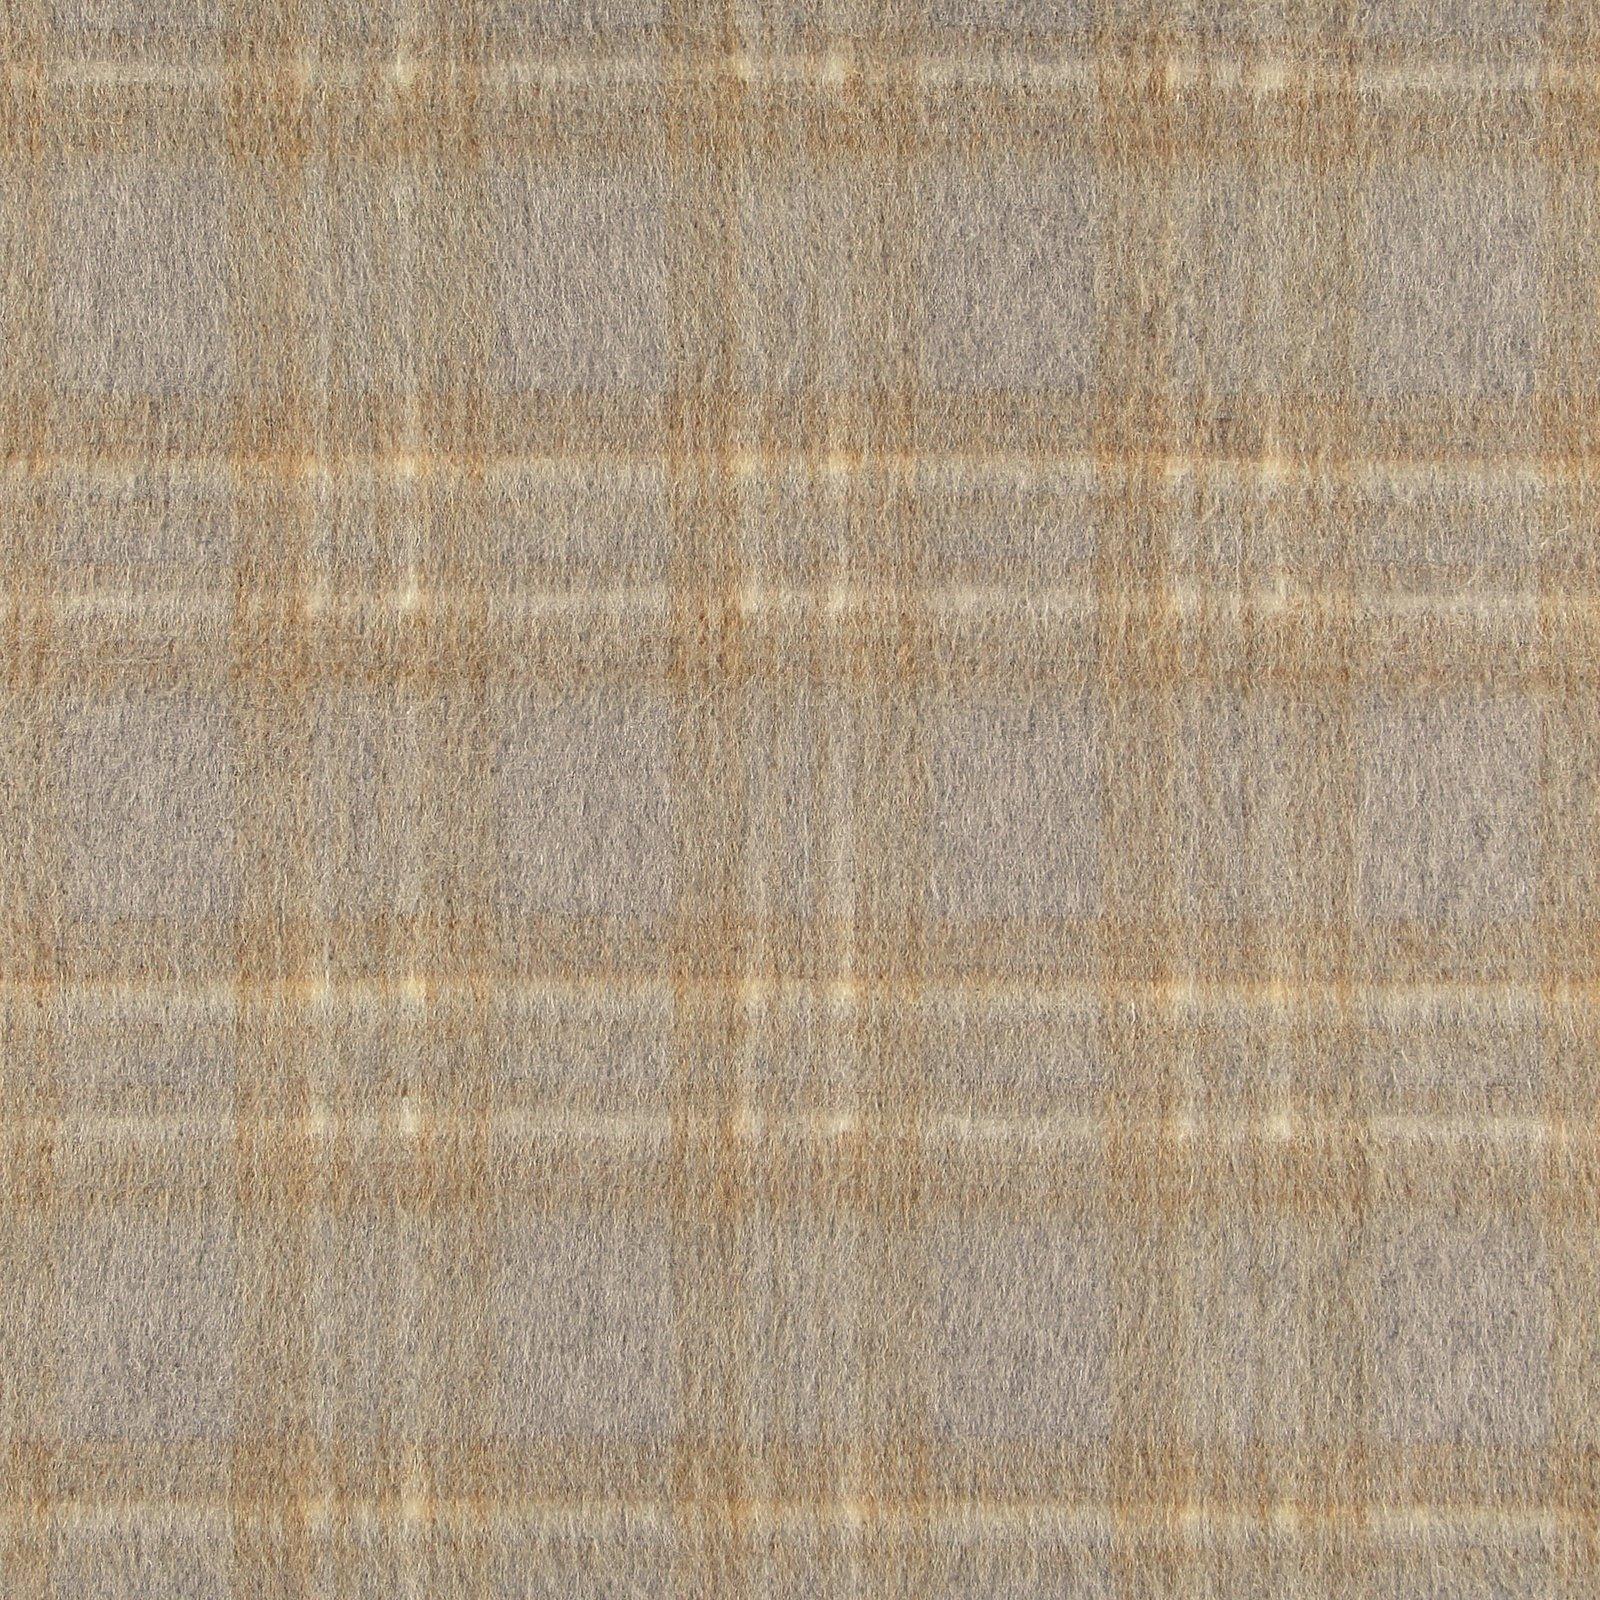 Wool felt grey/beige melange check 310363_pack_sp